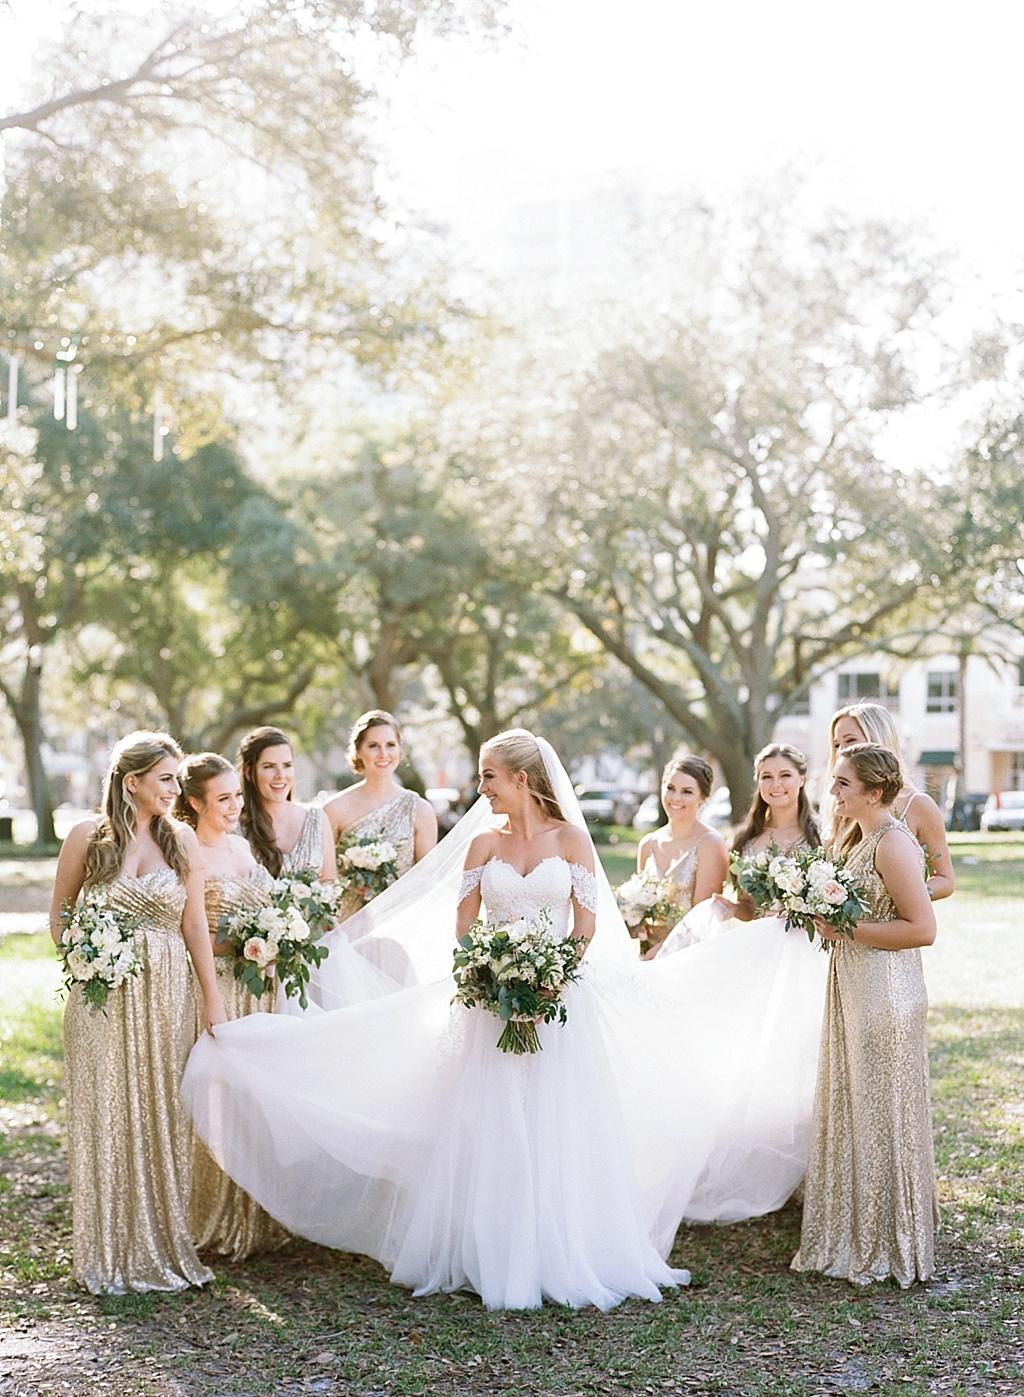 St. Pete Bride in Romantic Sweetheart Off the Shoulder Ballgown Wedding Dress, Bridesmaids in Randy Fenoli Sequin Gold Matching Dresses Holding Brides Dress Fun Wedding Portrait